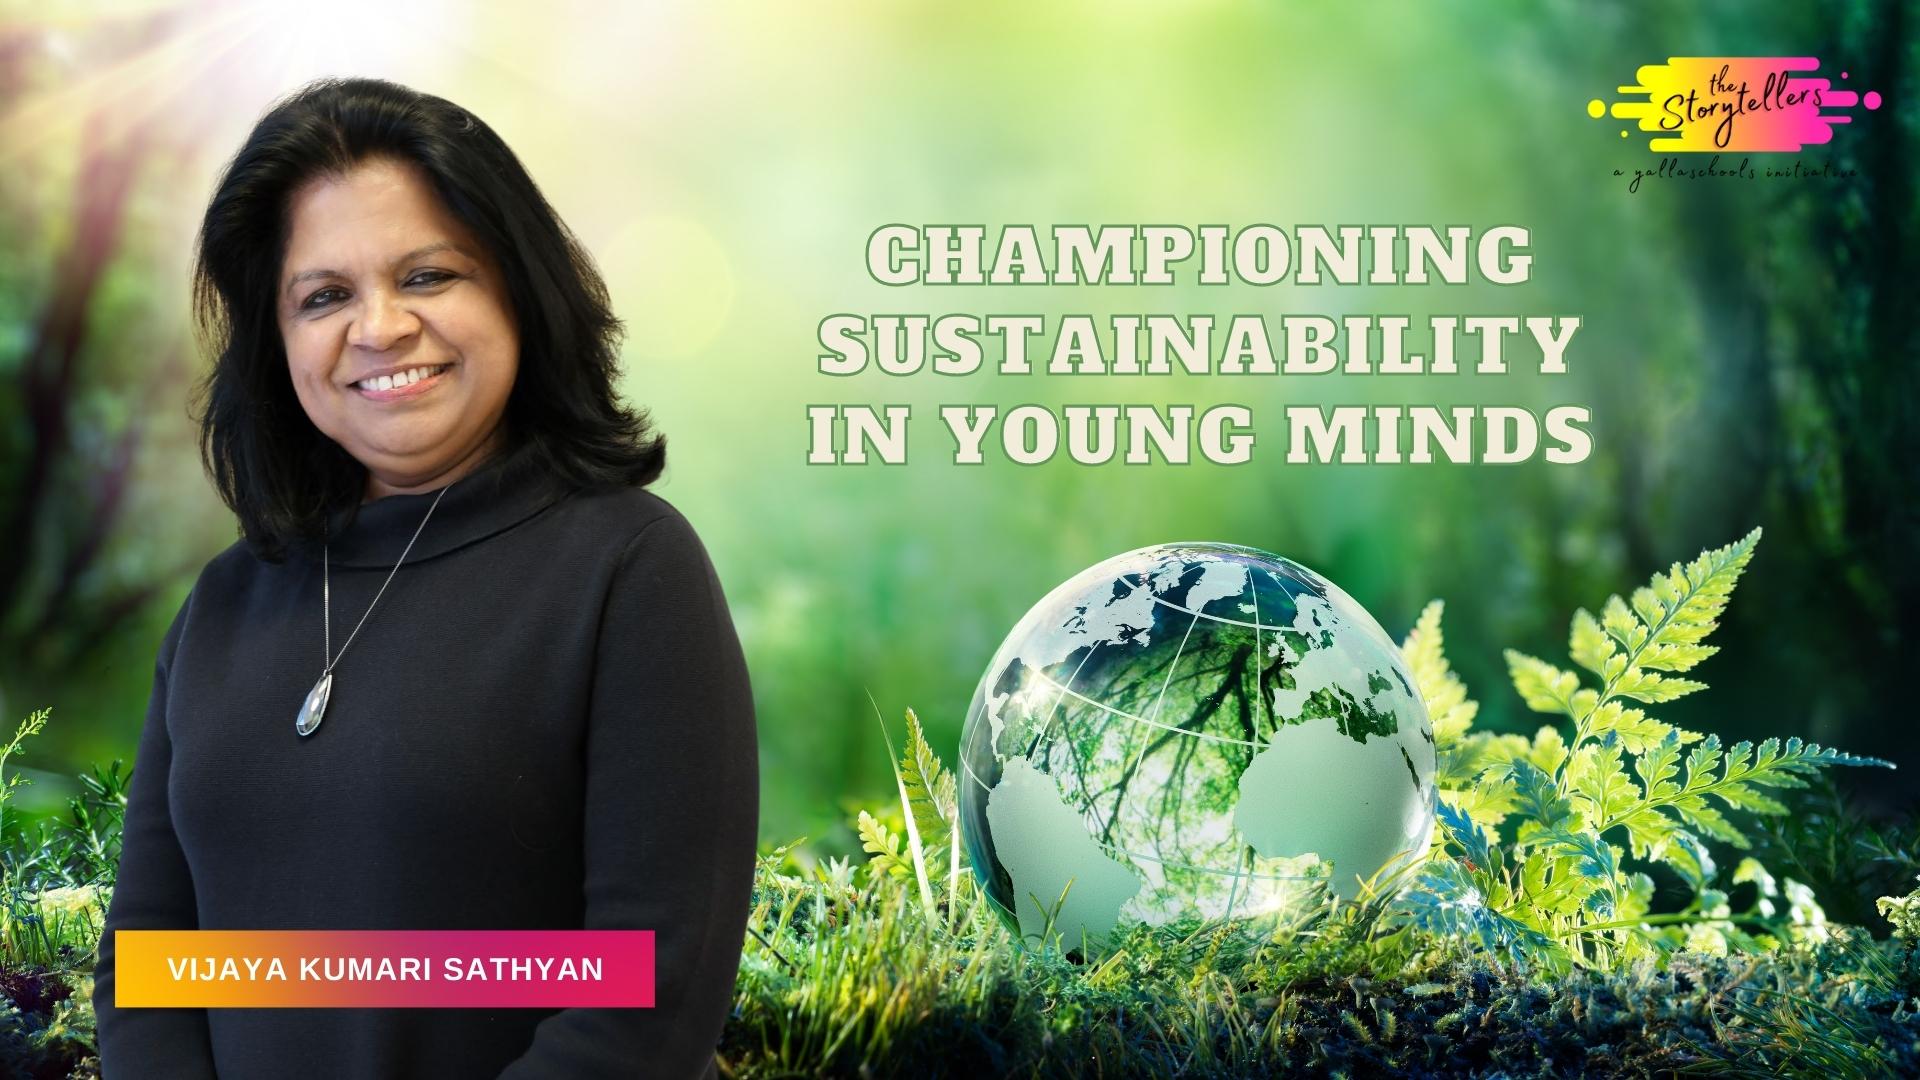 Vijaya_Kumari_Sathyan_-_Championing_Sustainability